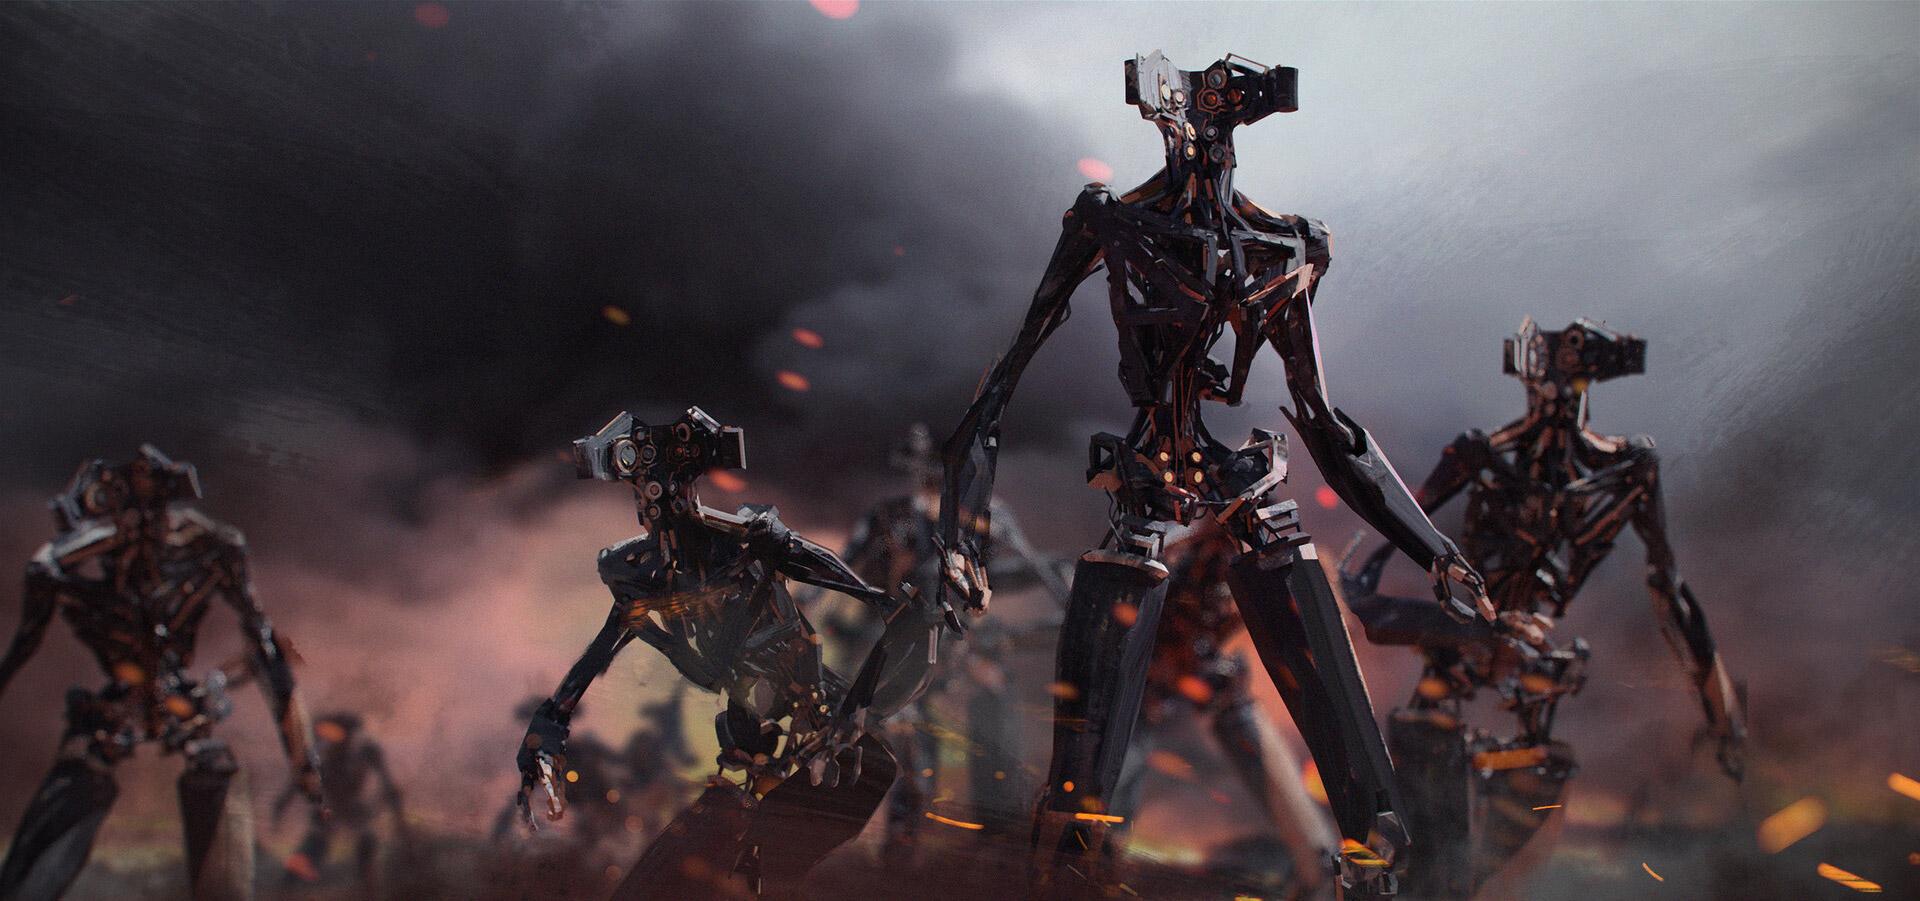 The Stunning Sci-Fi Art of Christoph Stryczek